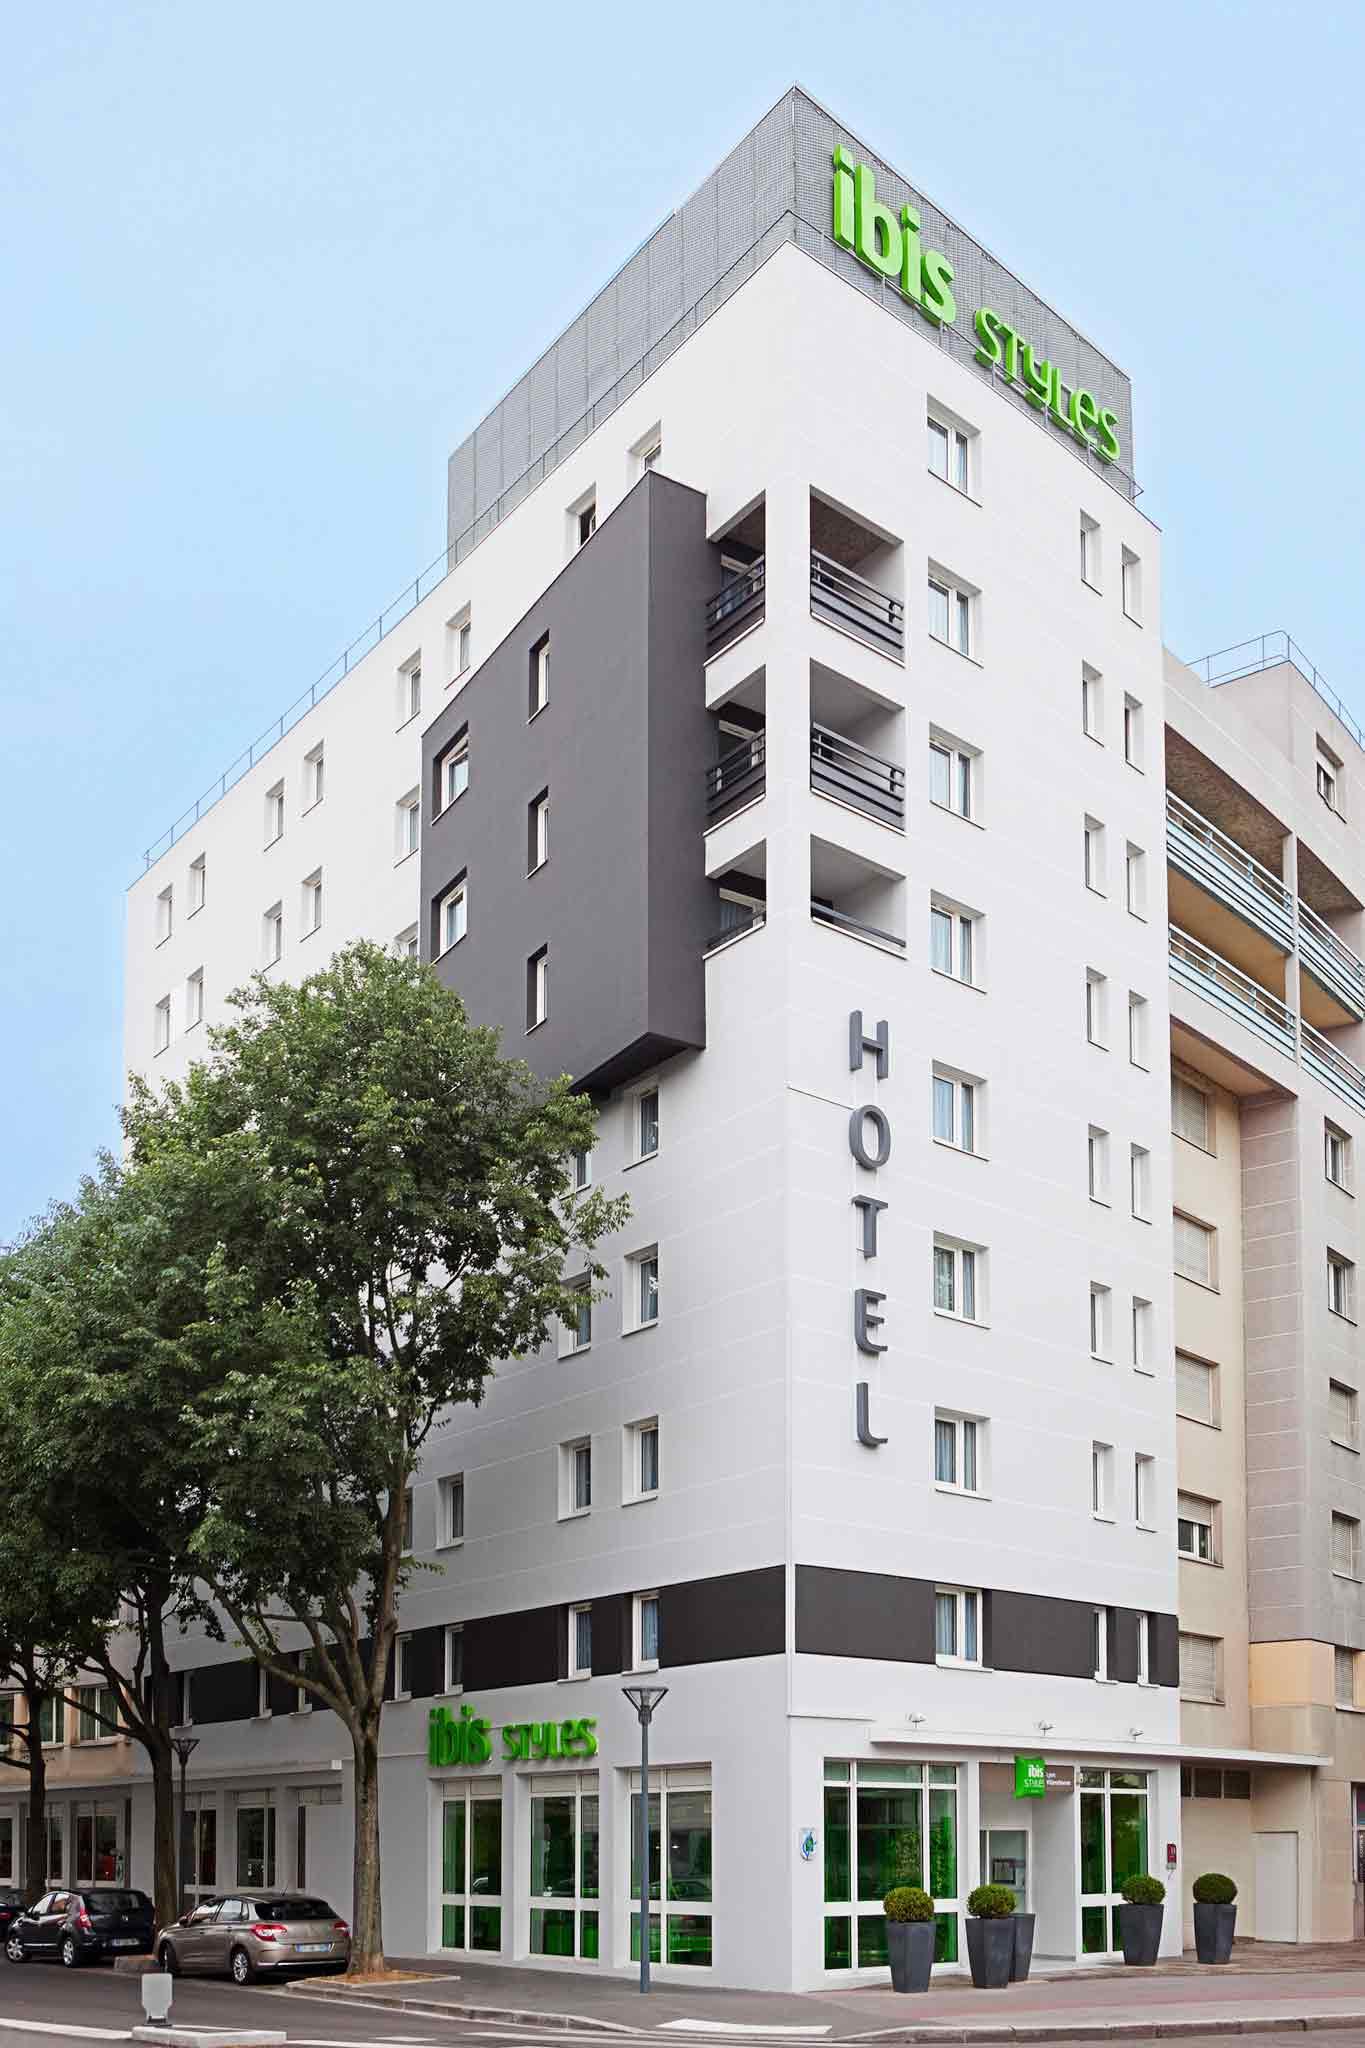 Hotel De Ville Villeurbanne